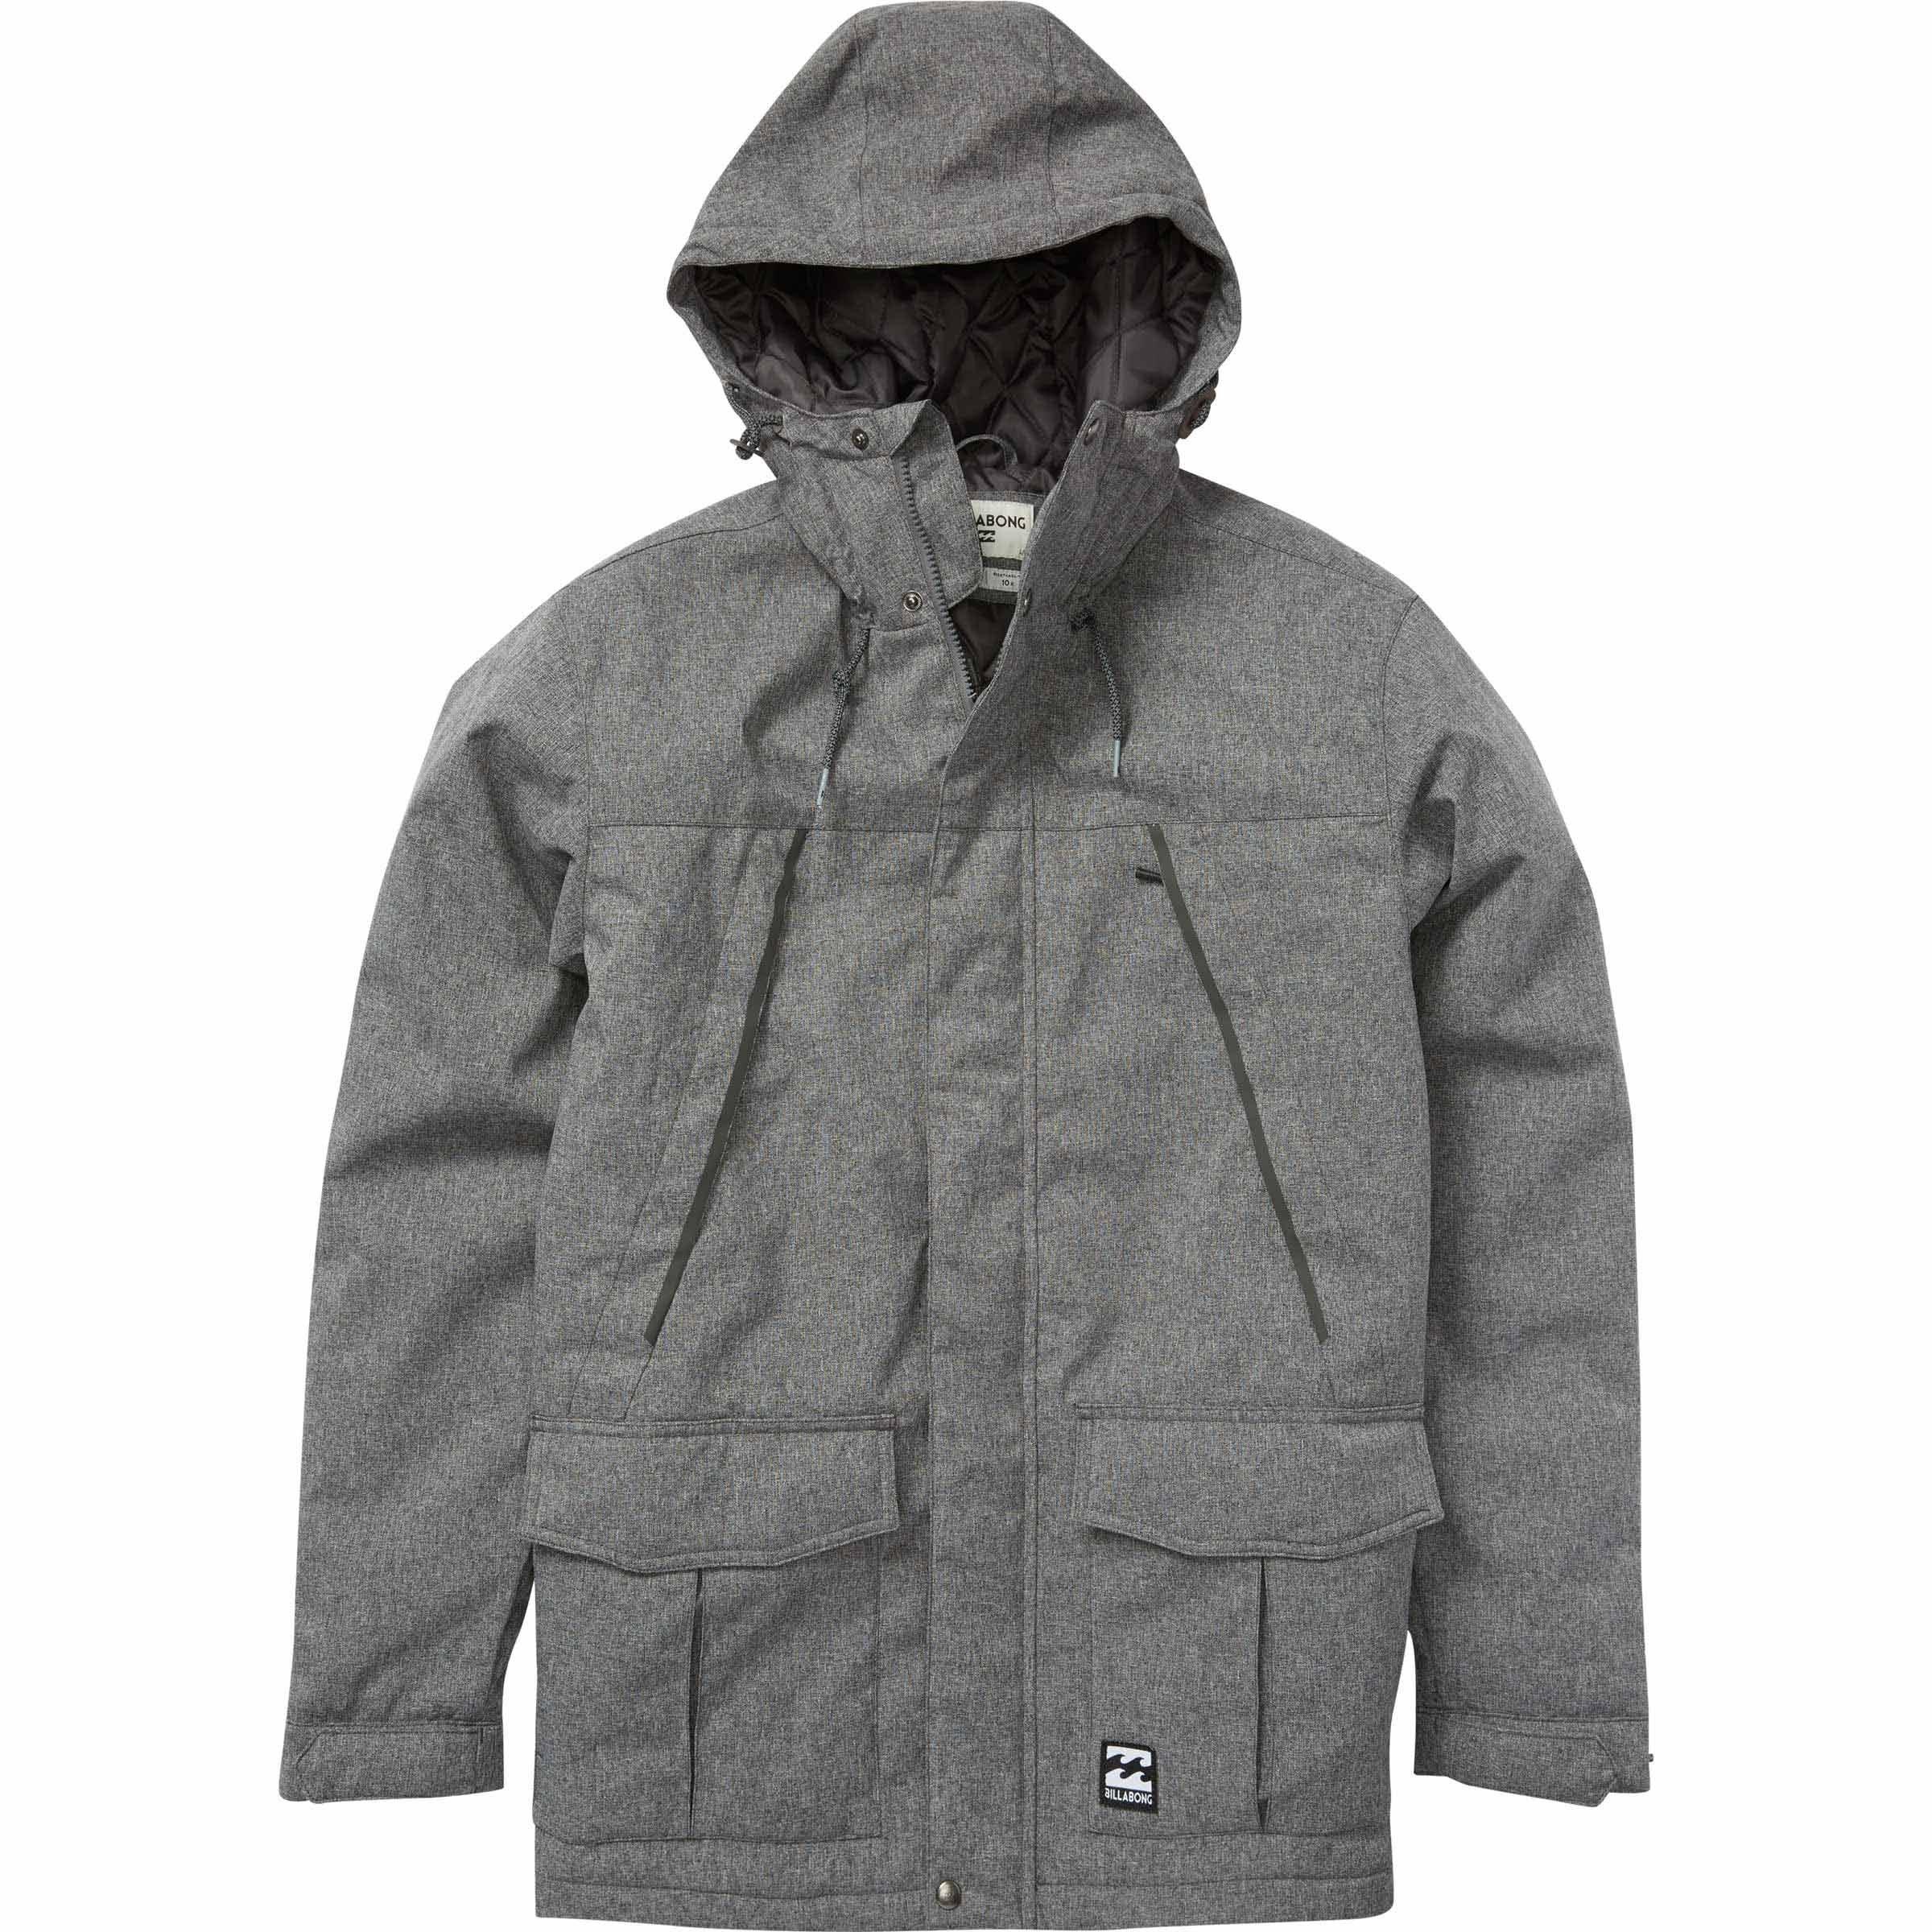 Billabong Men's Alves Jacket, Black Heather, L